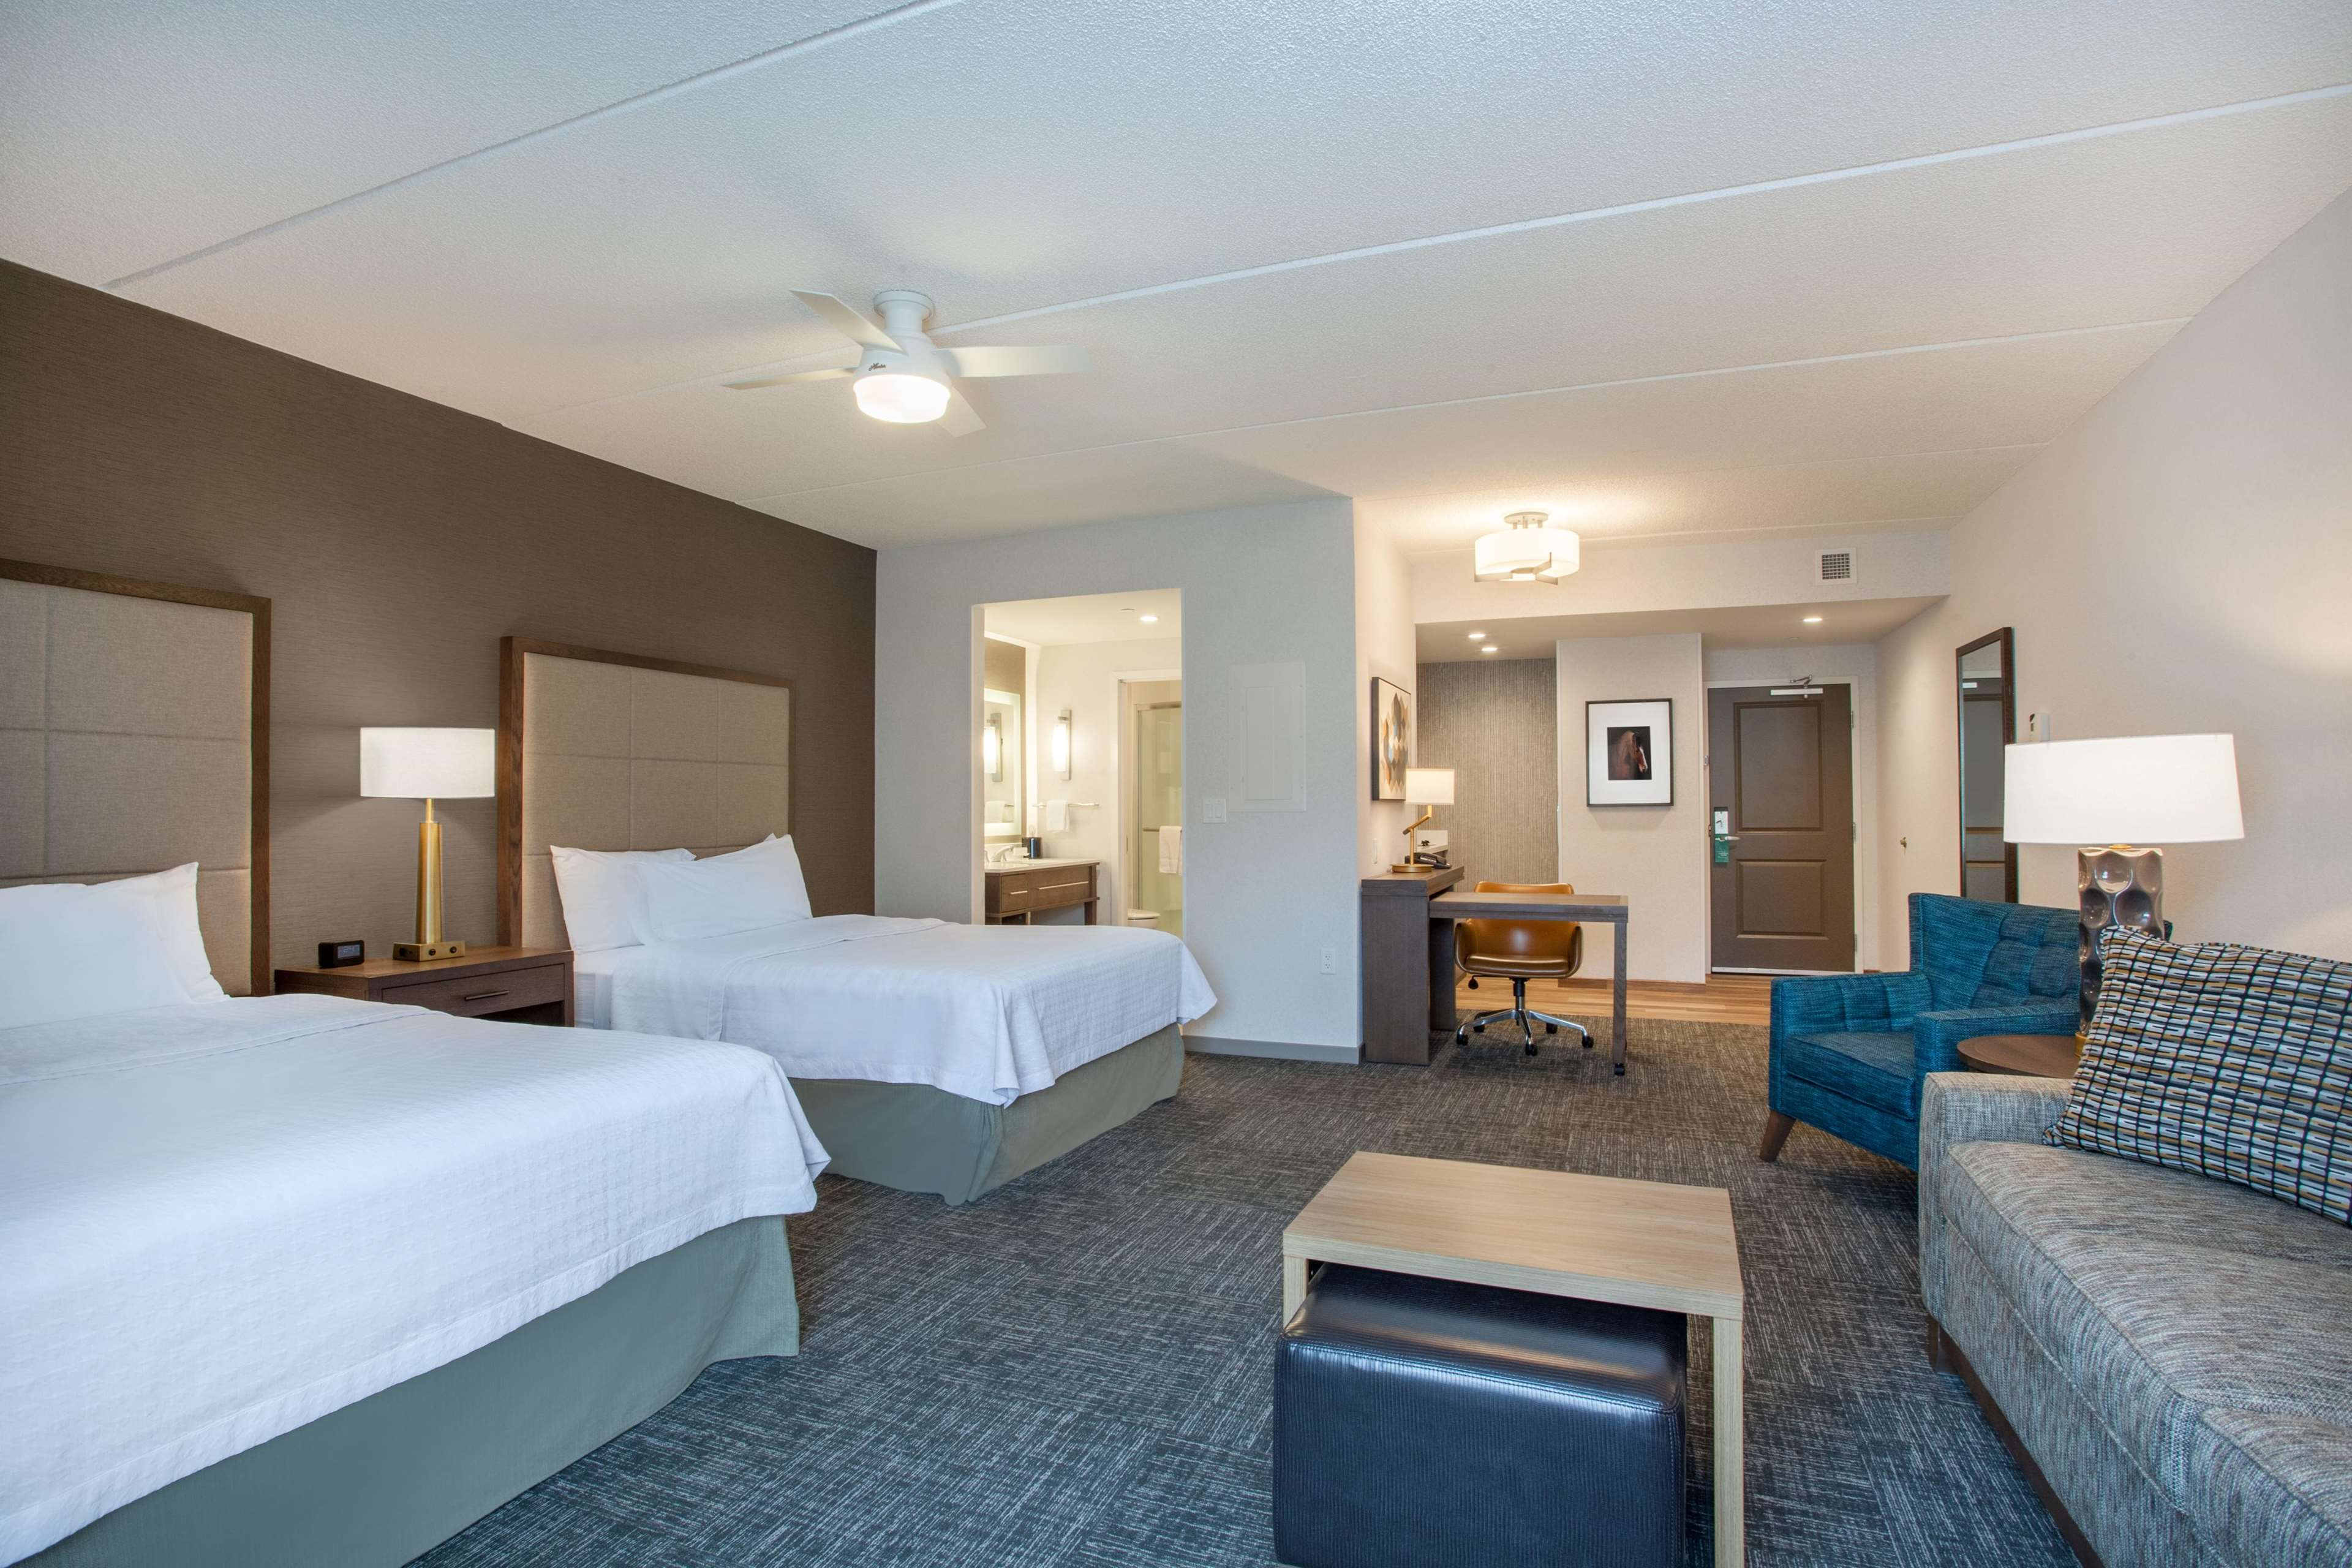 Homewood Suites by Hilton Saratoga Springs image 25